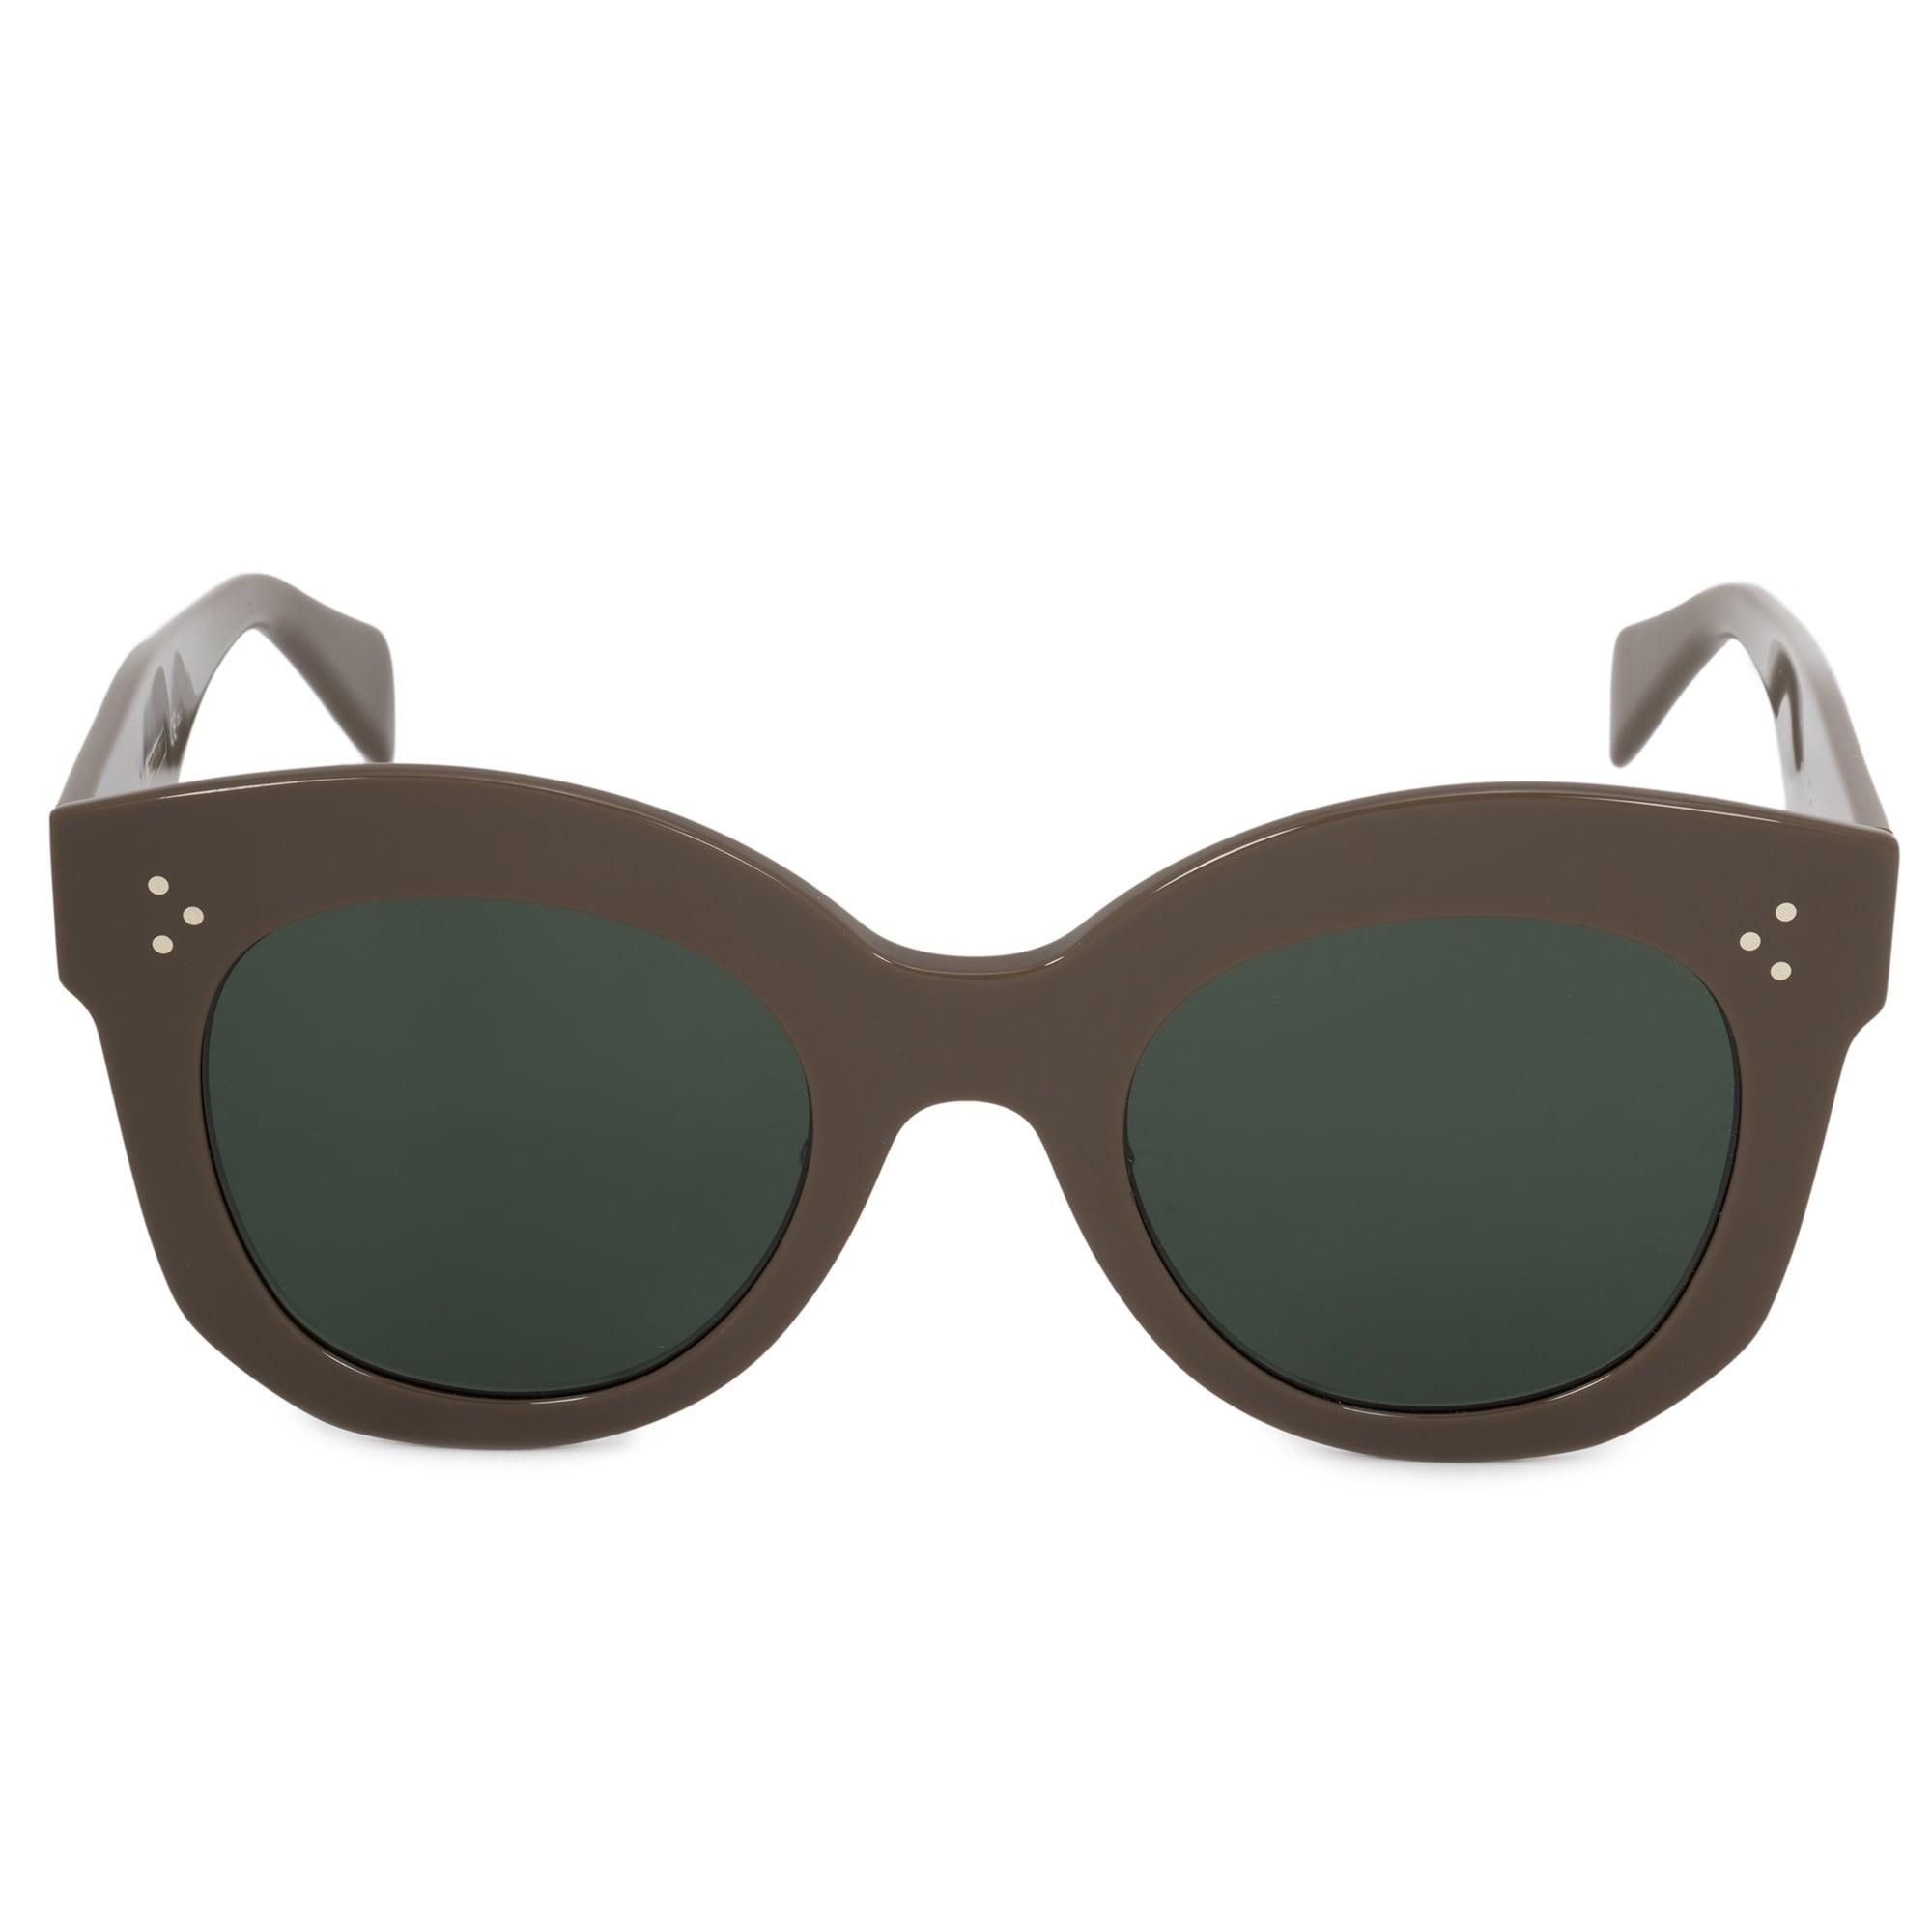 2b3f1fd1774 Celine Women s Sunglasses